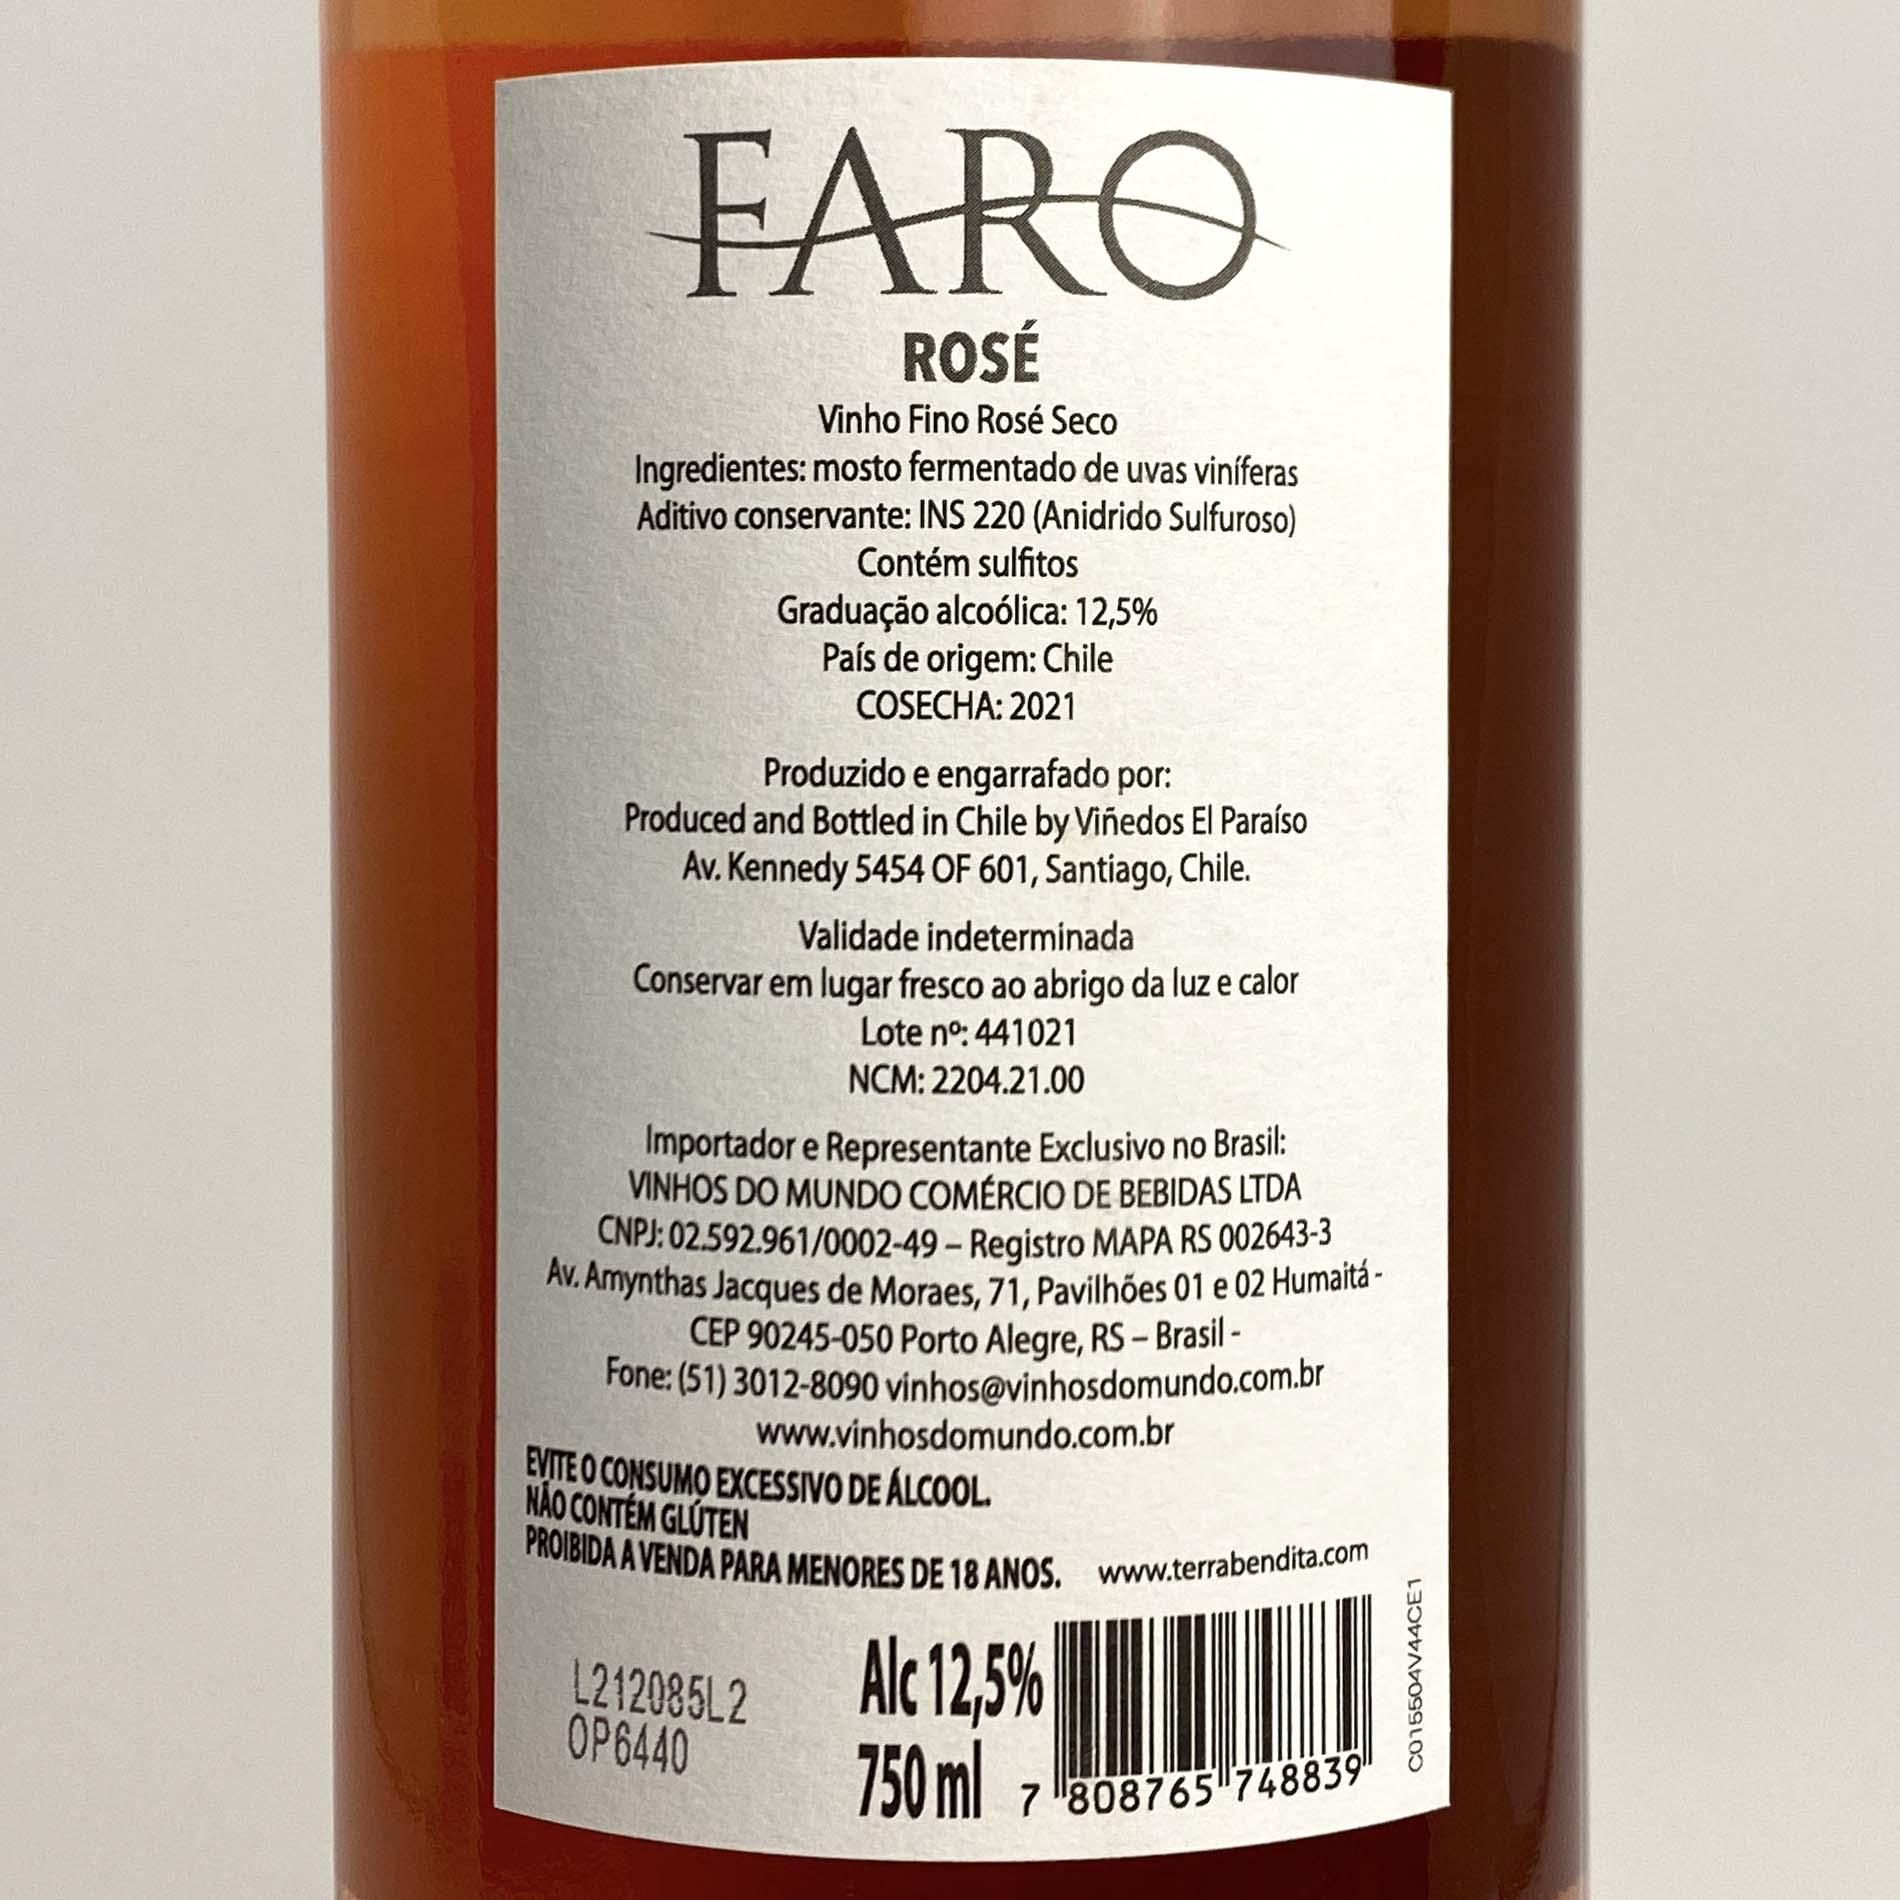 Faro Syrah Rose (Chileno)  - Vinerize